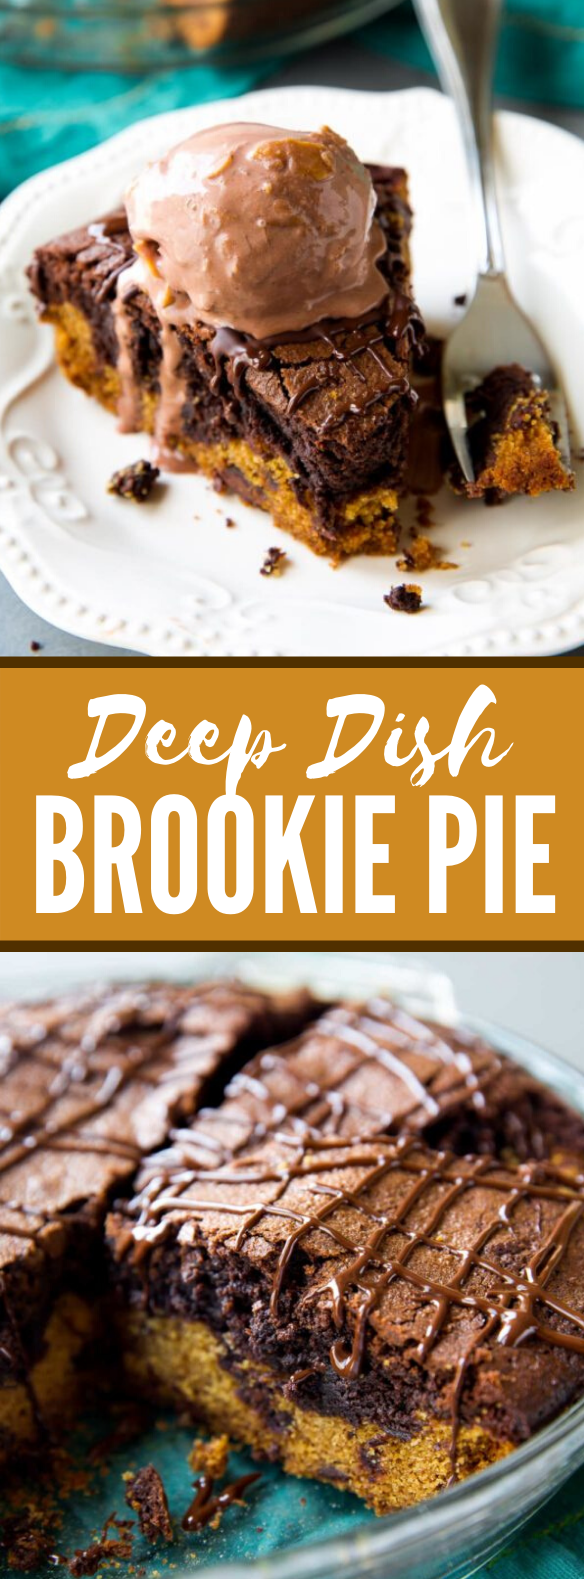 Brookie Pie #desserts #chocolate